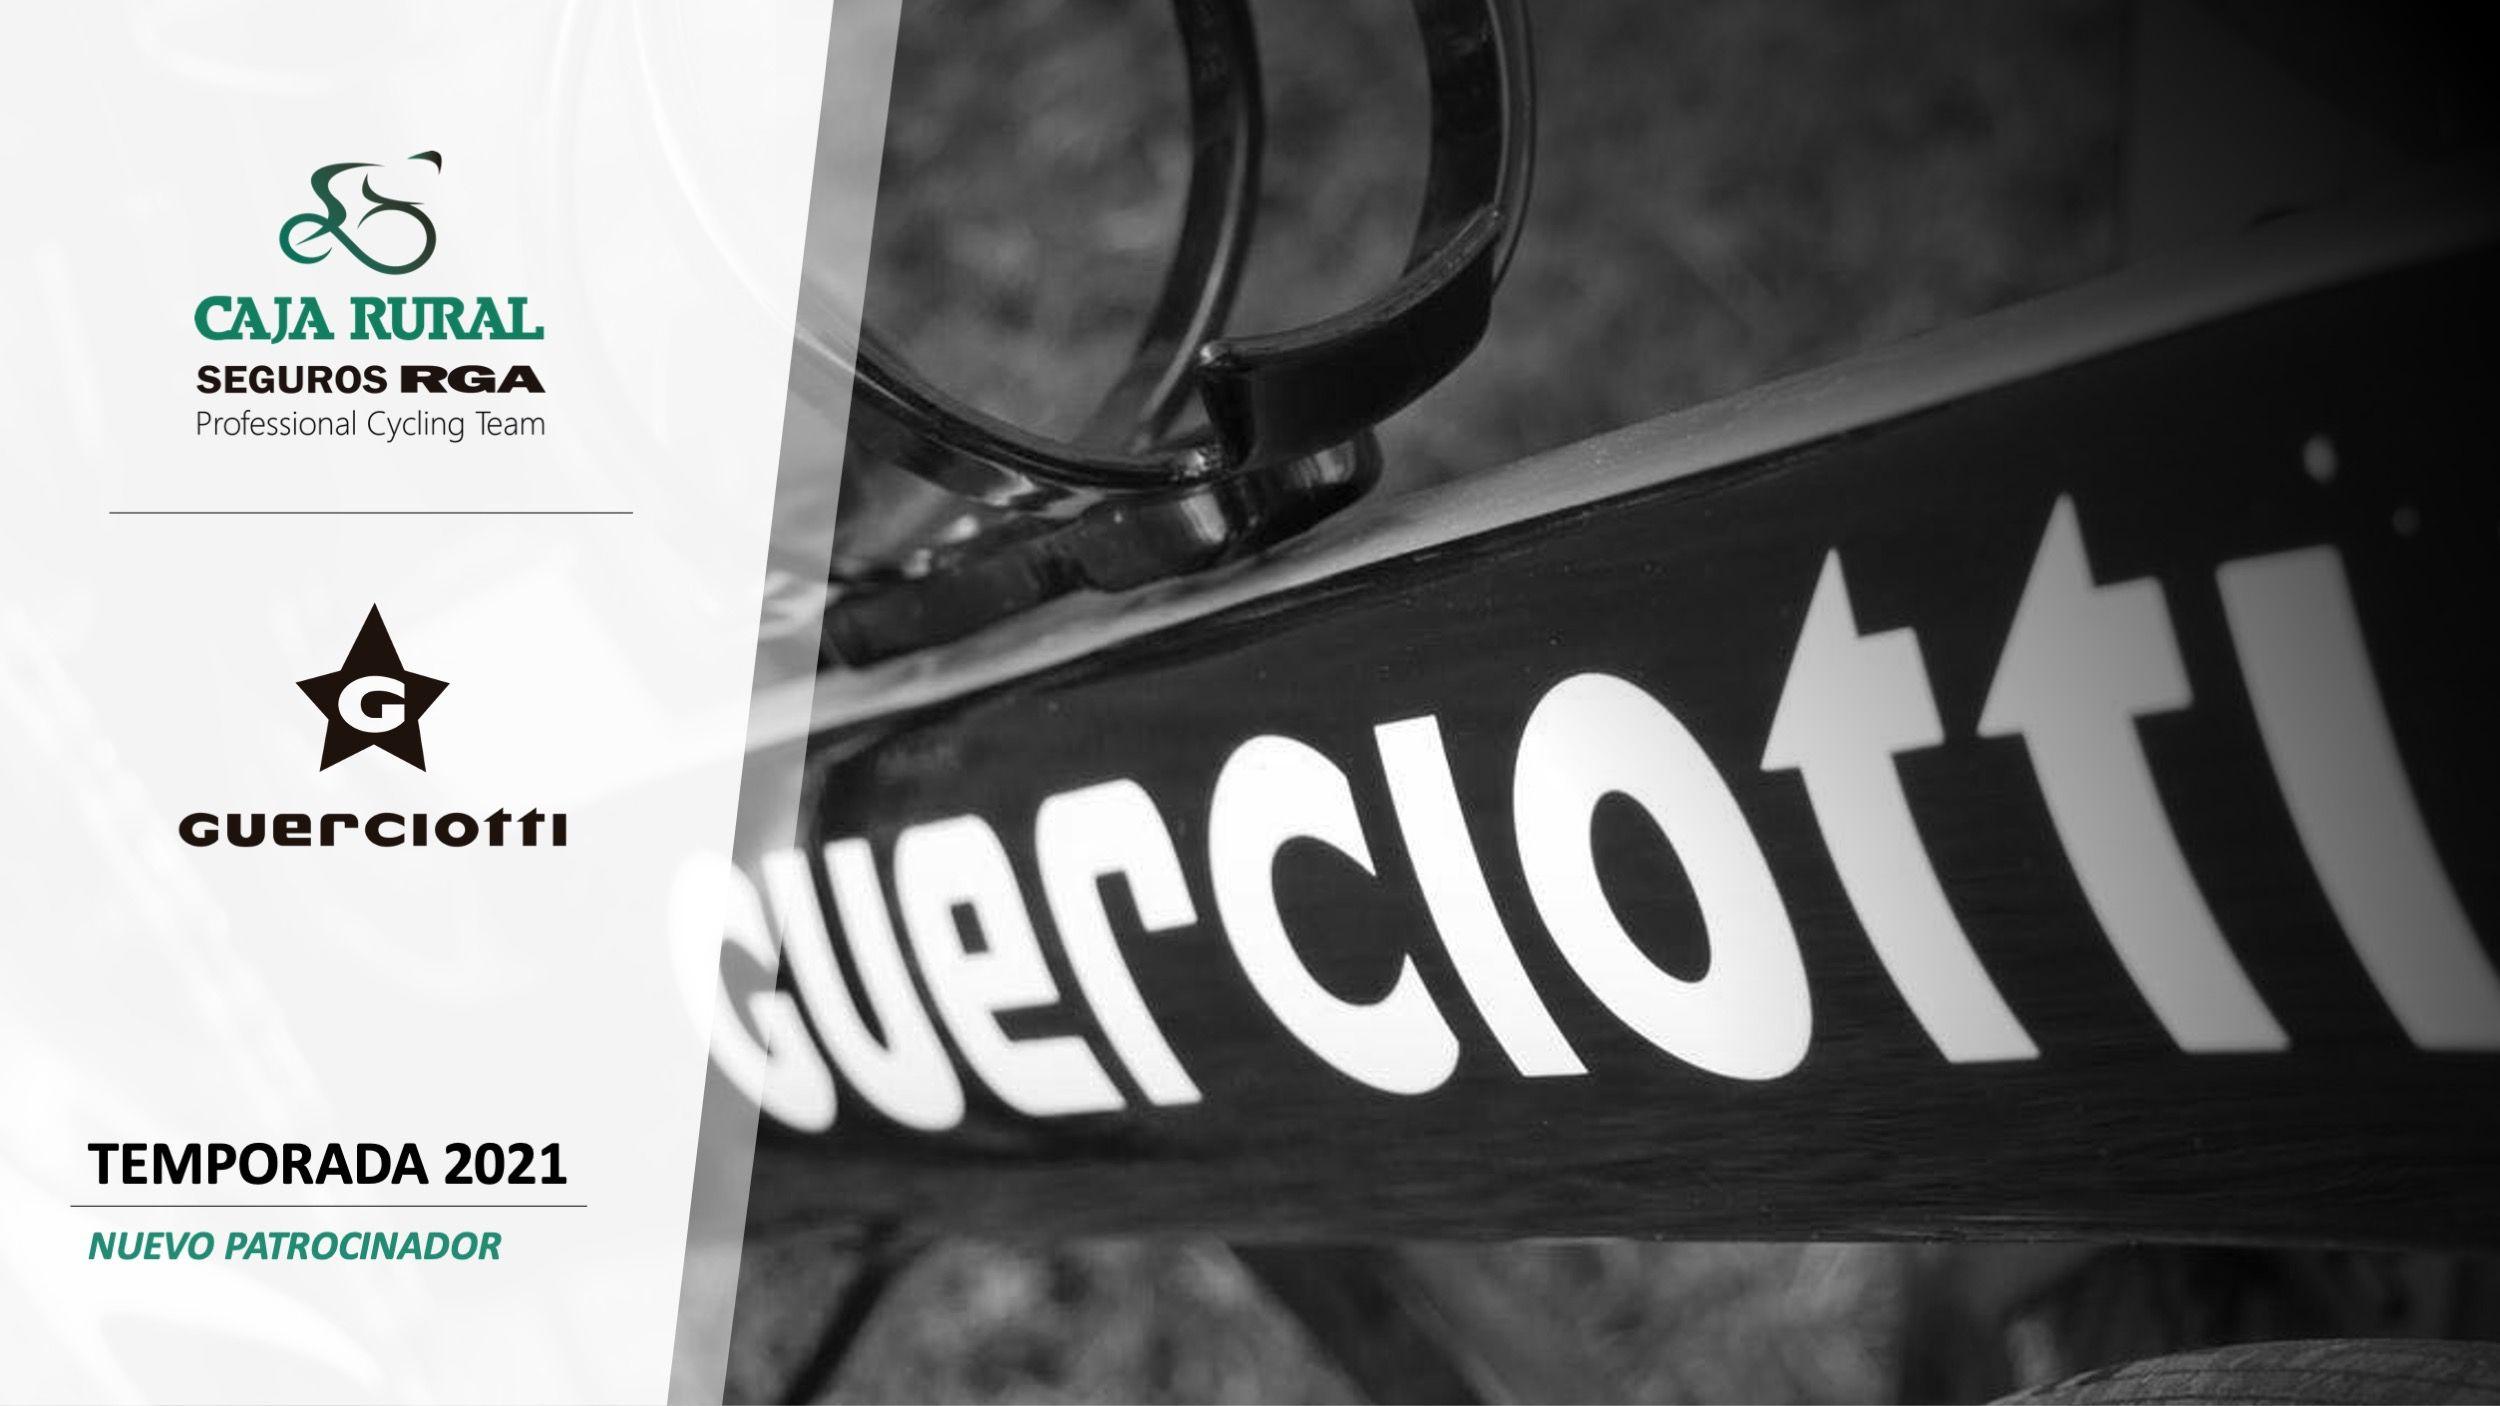 Caja Rural-Seguros RGA utilizará bicicletas Guerciotti